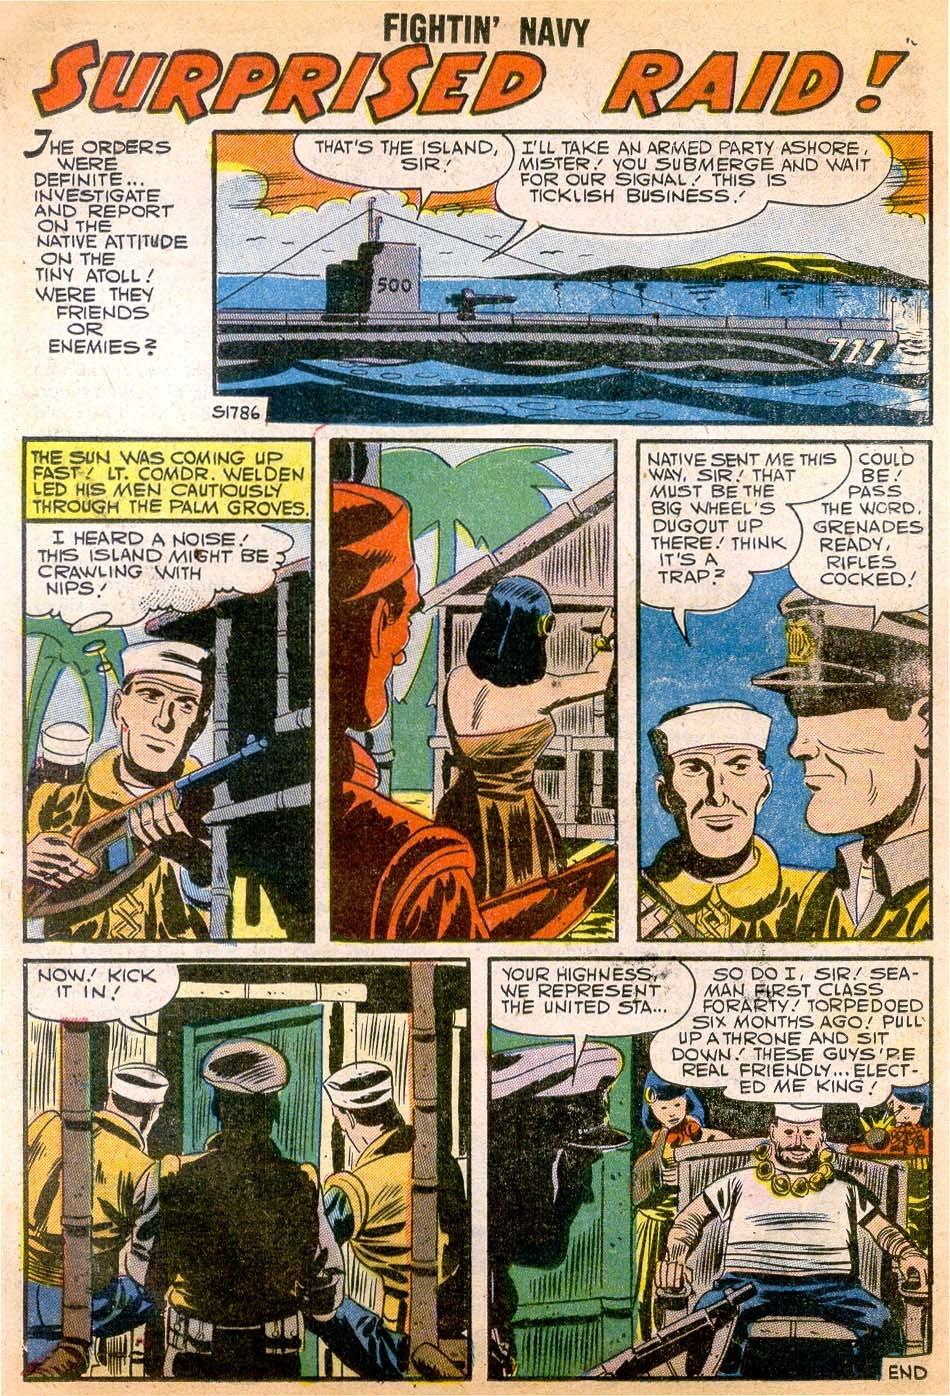 Read online Fightin' Navy comic -  Issue #79 - 20